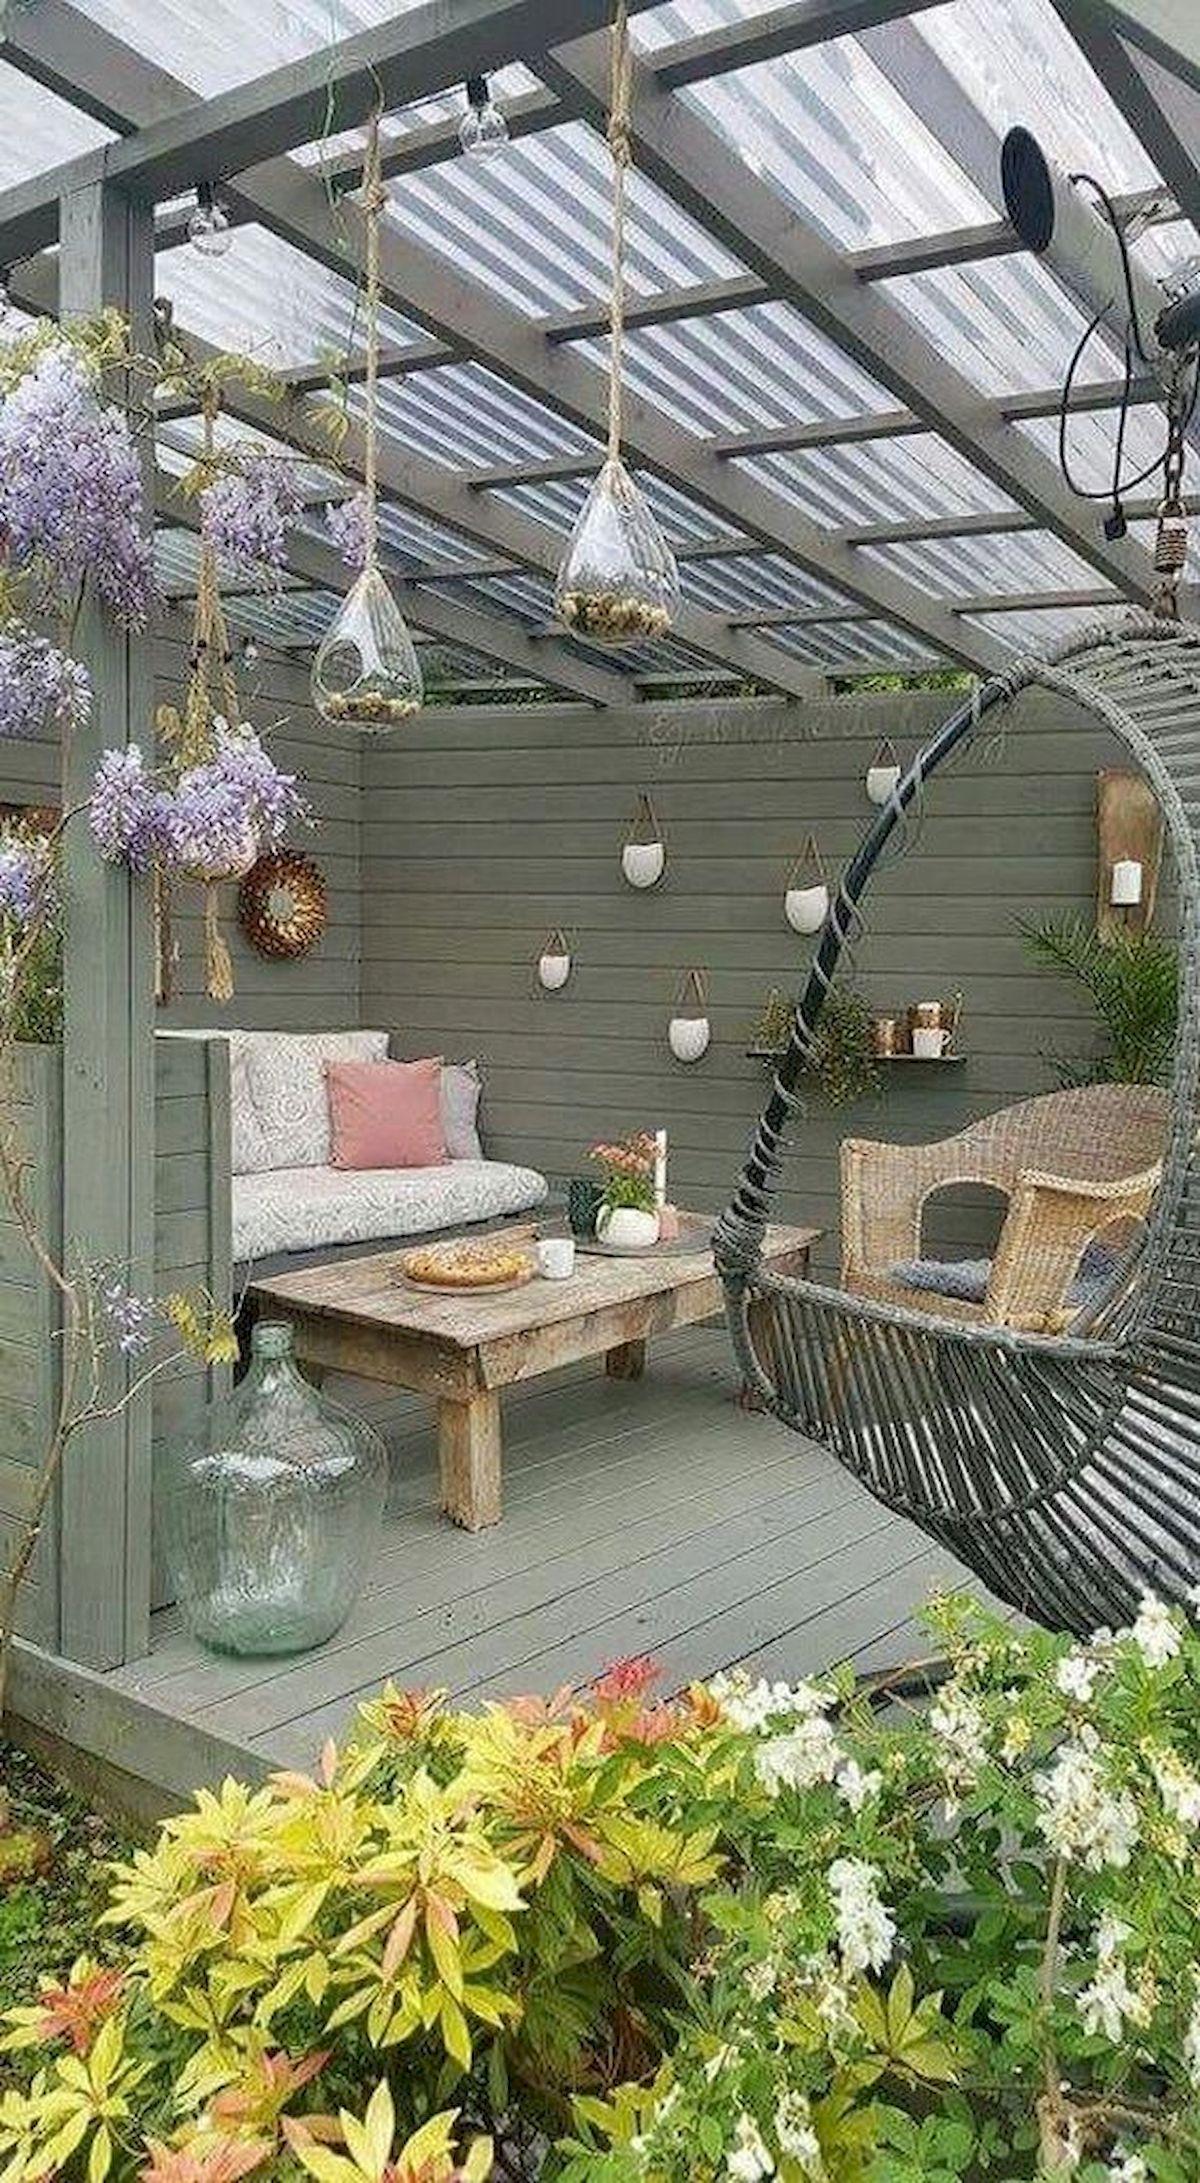 50 Fantastic Backyard Patio and Decking Design Ideas (40)